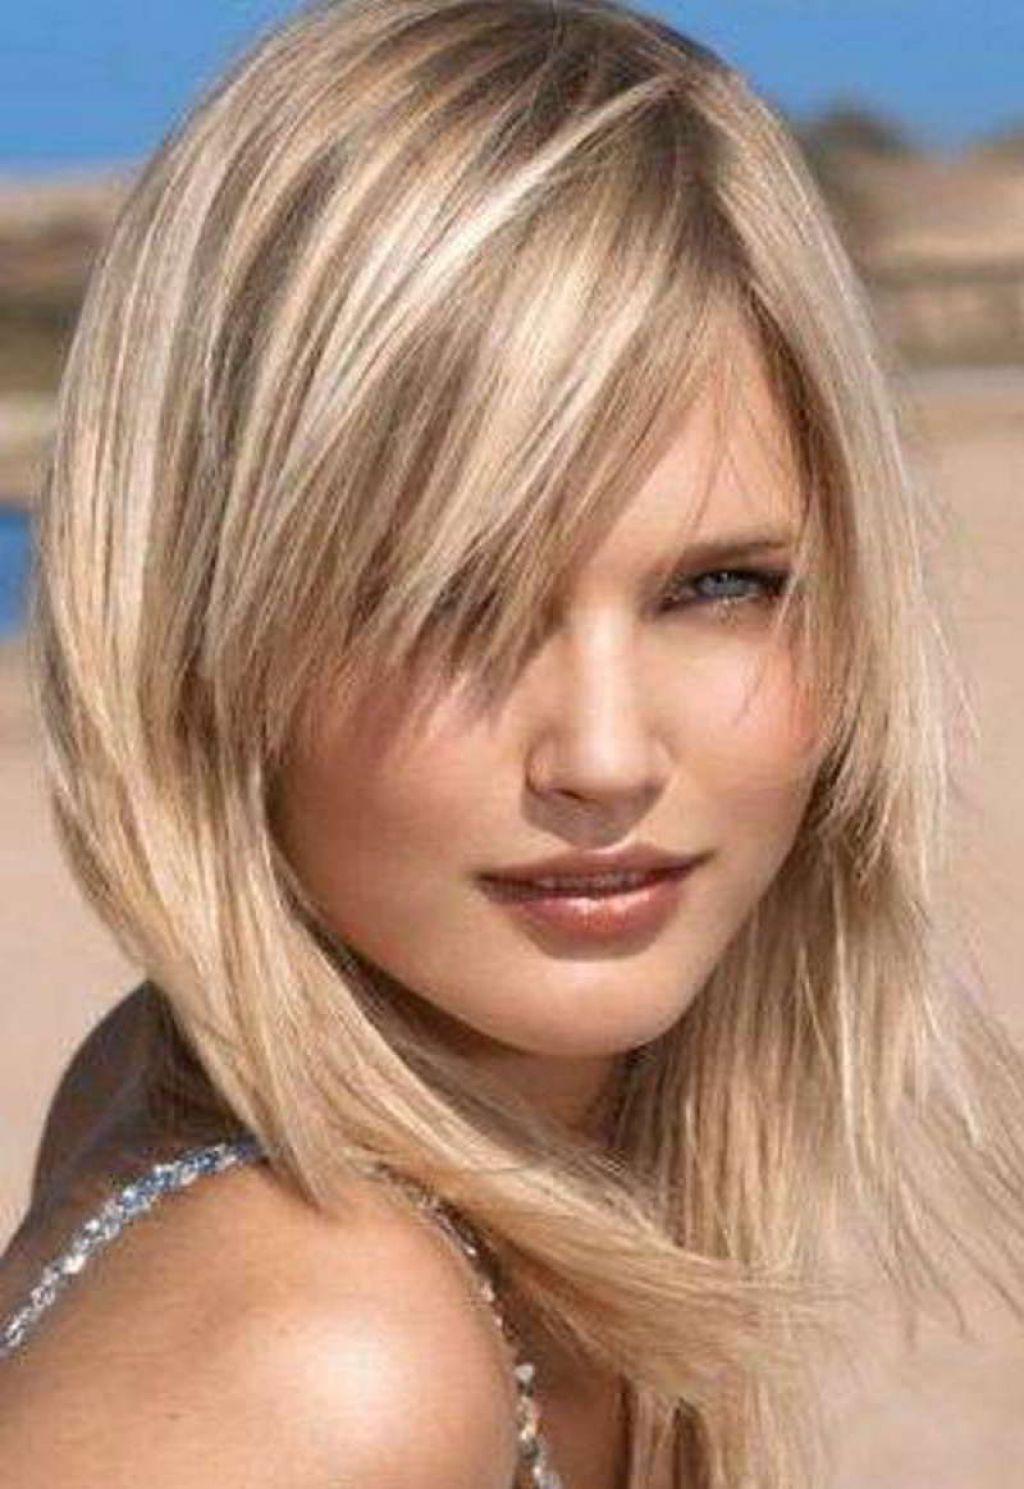 Short Layered Hairstyles Thin Hair | Hair | Pinterest | Hair Pertaining To Bohemian Short Hairstyles (View 20 of 25)